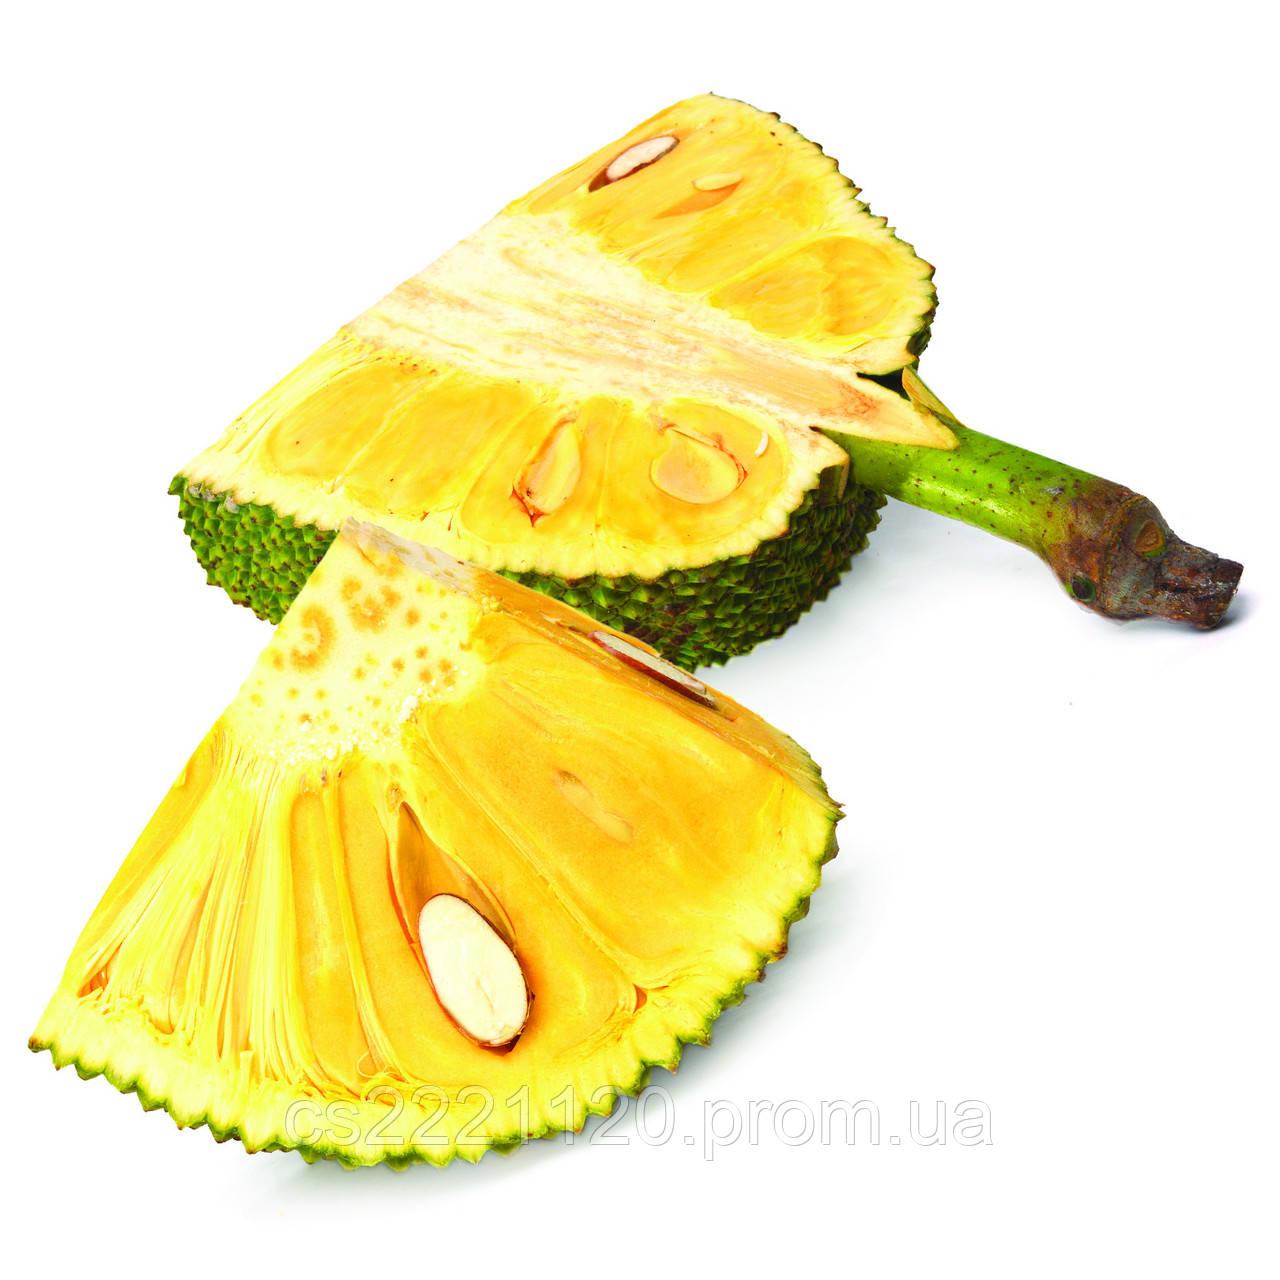 Ароматизатор TPA Jack Fruit (Джекфрут) 5мл.